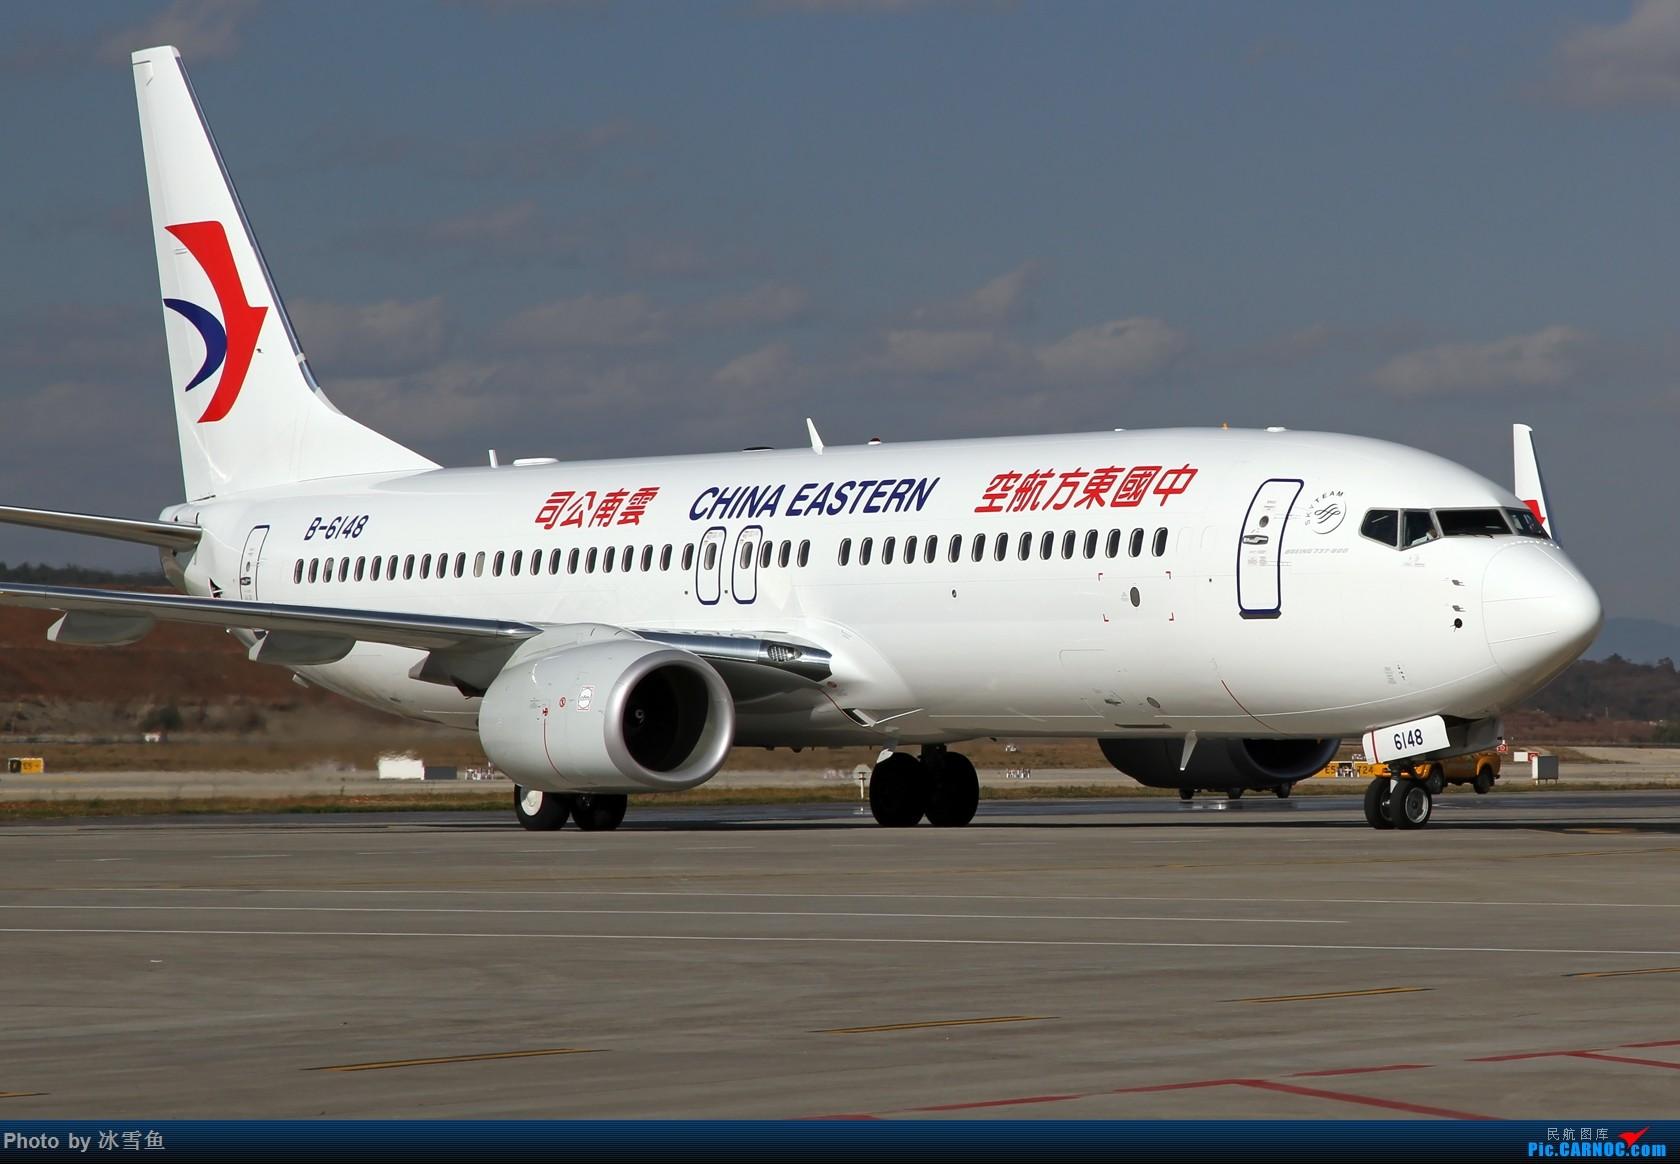 Re:[原创]【BLDDQ-昆明飞友会】春节假期有时间去长水拍拍,不要问我位置............ BOEING 737-800 B-6148 中国昆明长水国际机场